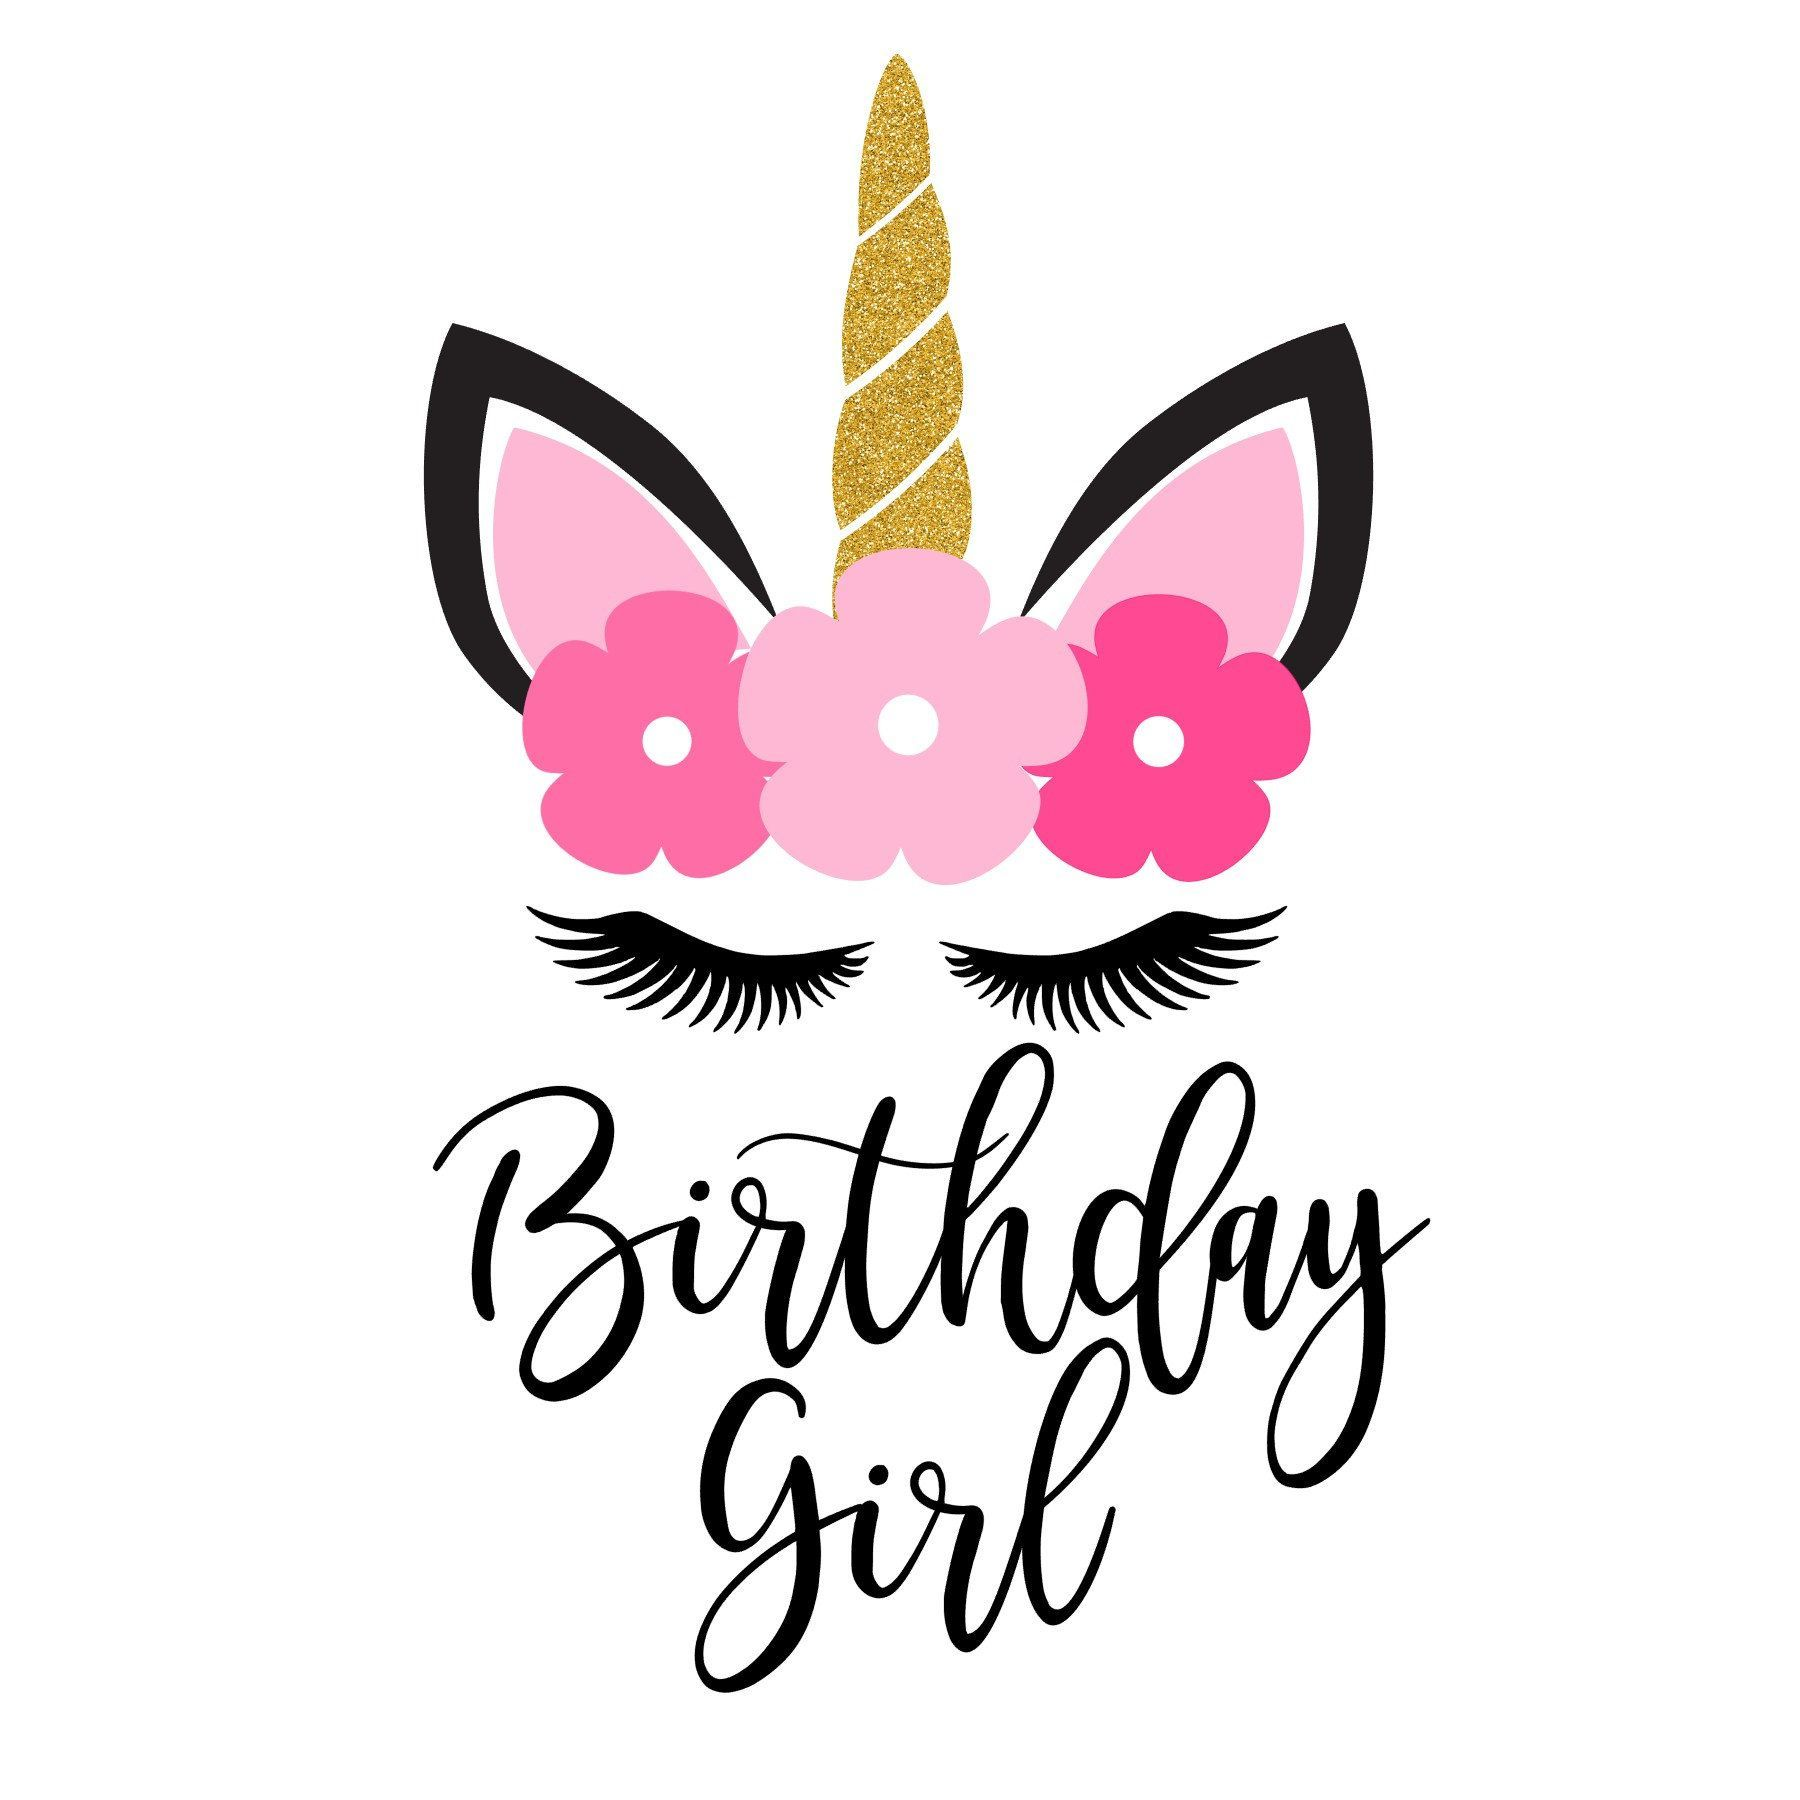 Birthday Girl Unicorn SVG Birthday girl quotes, Happy